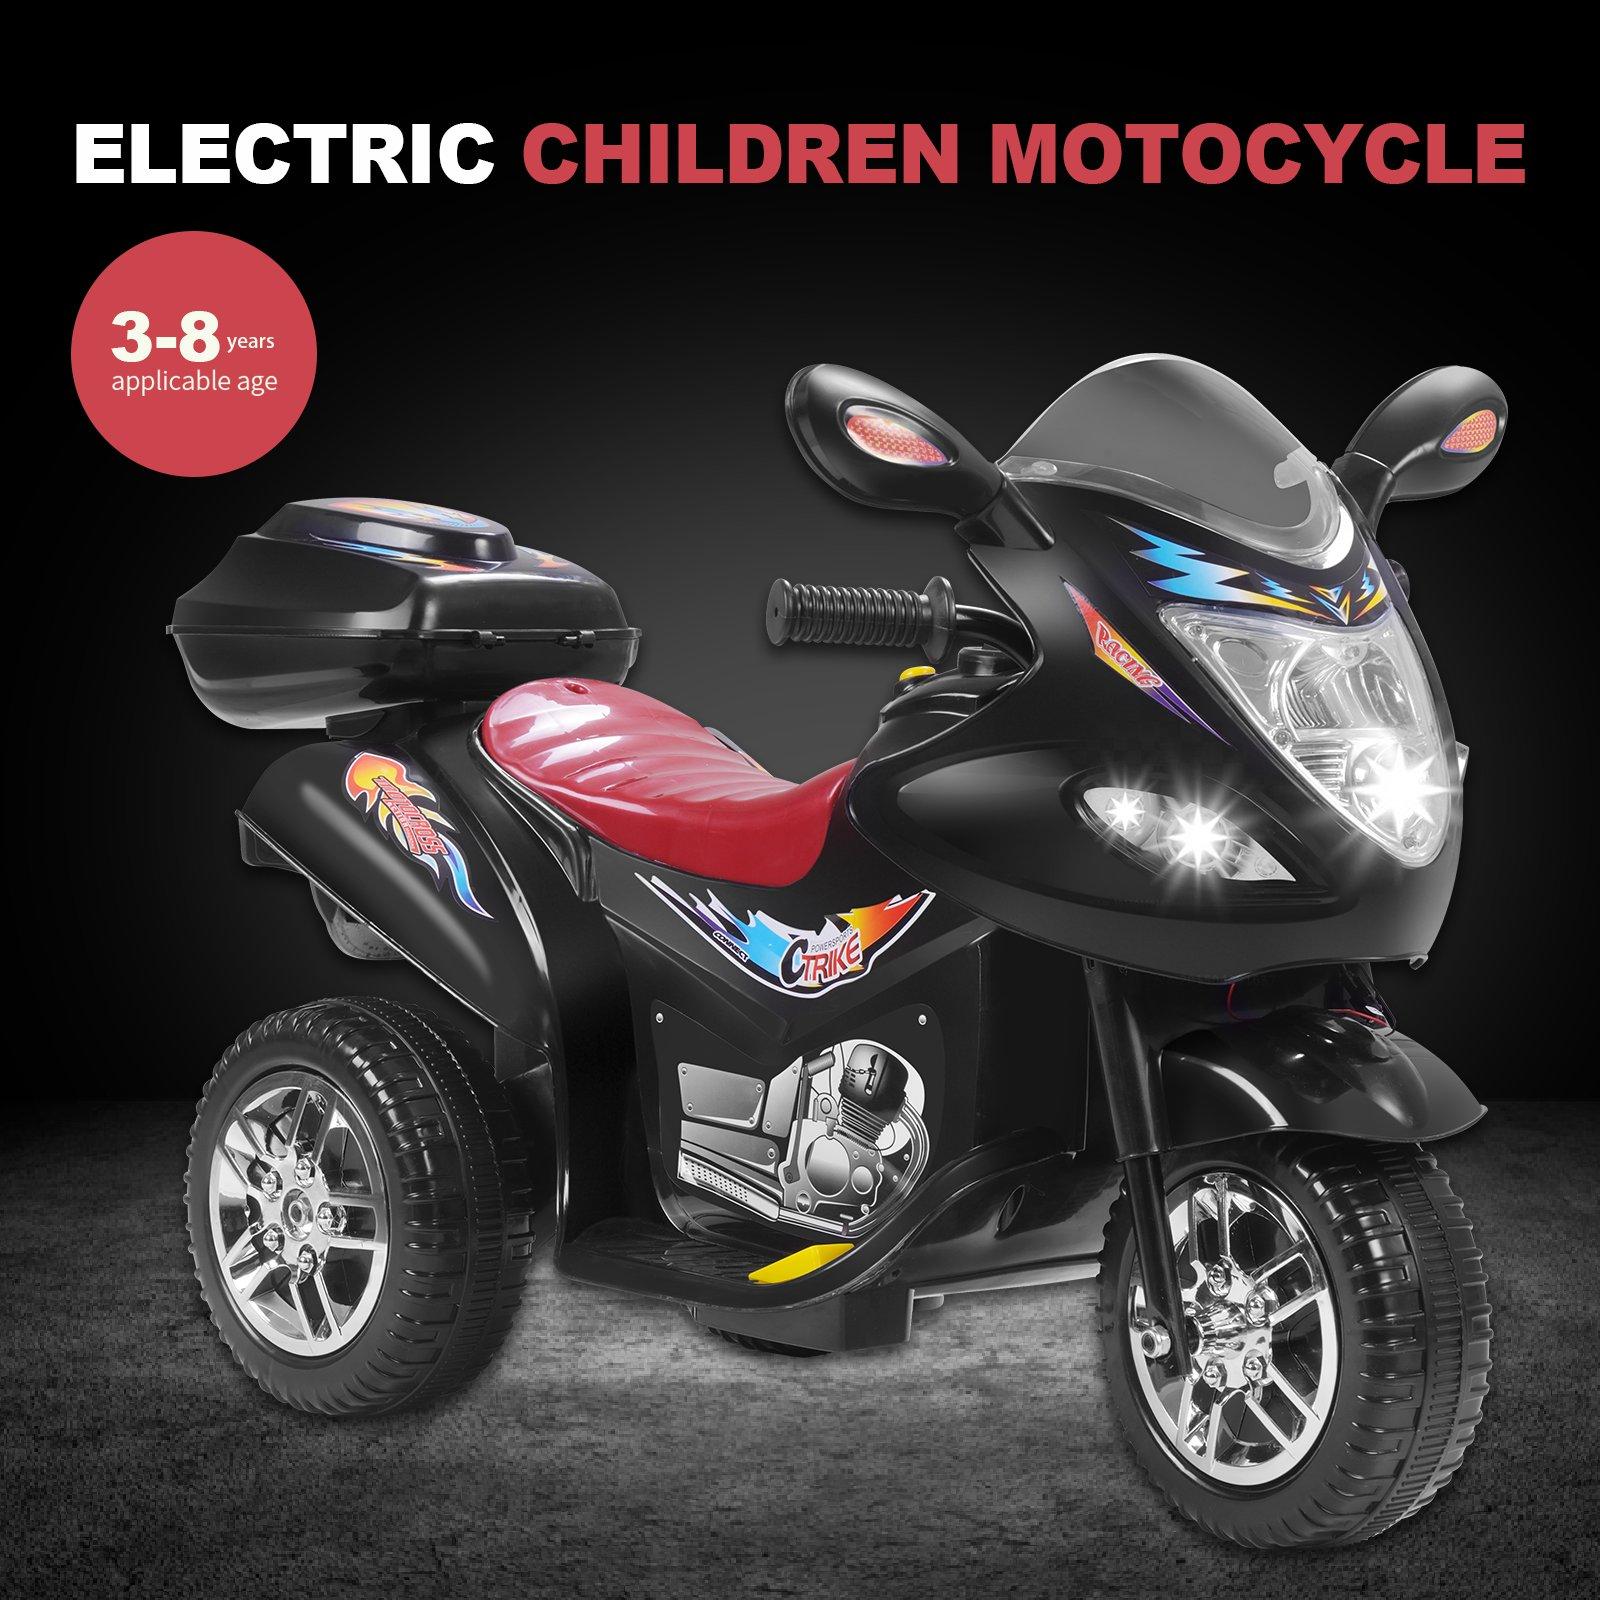 Uenjoy Murtisol Kids Ride on Motorcycle 6V Electric Motorcycle 2 Wheels Black by Uenjoy (Image #2)